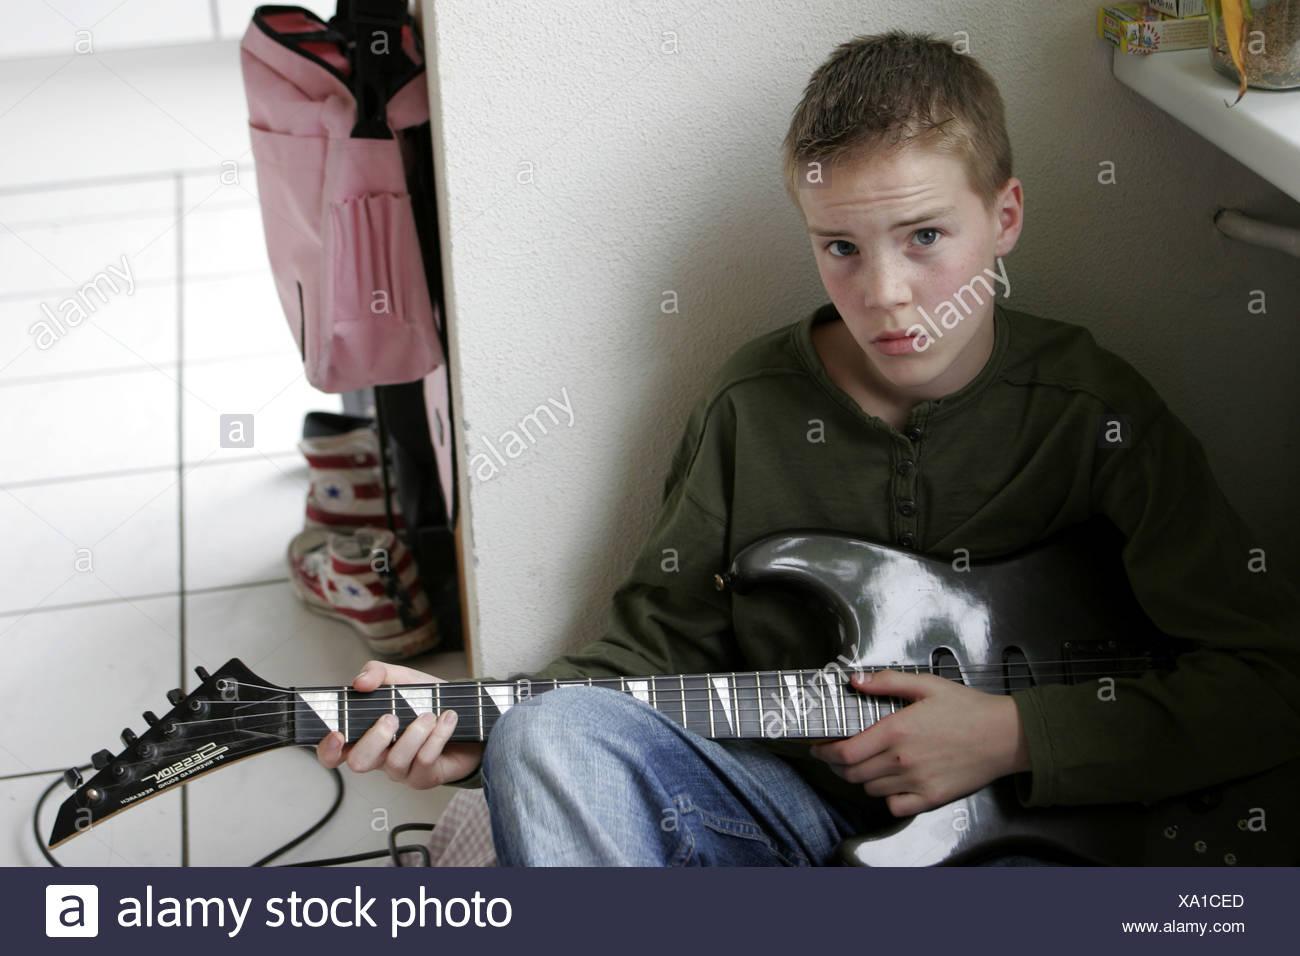 Boy guitar  - SerieCVS217069 - Stock Image